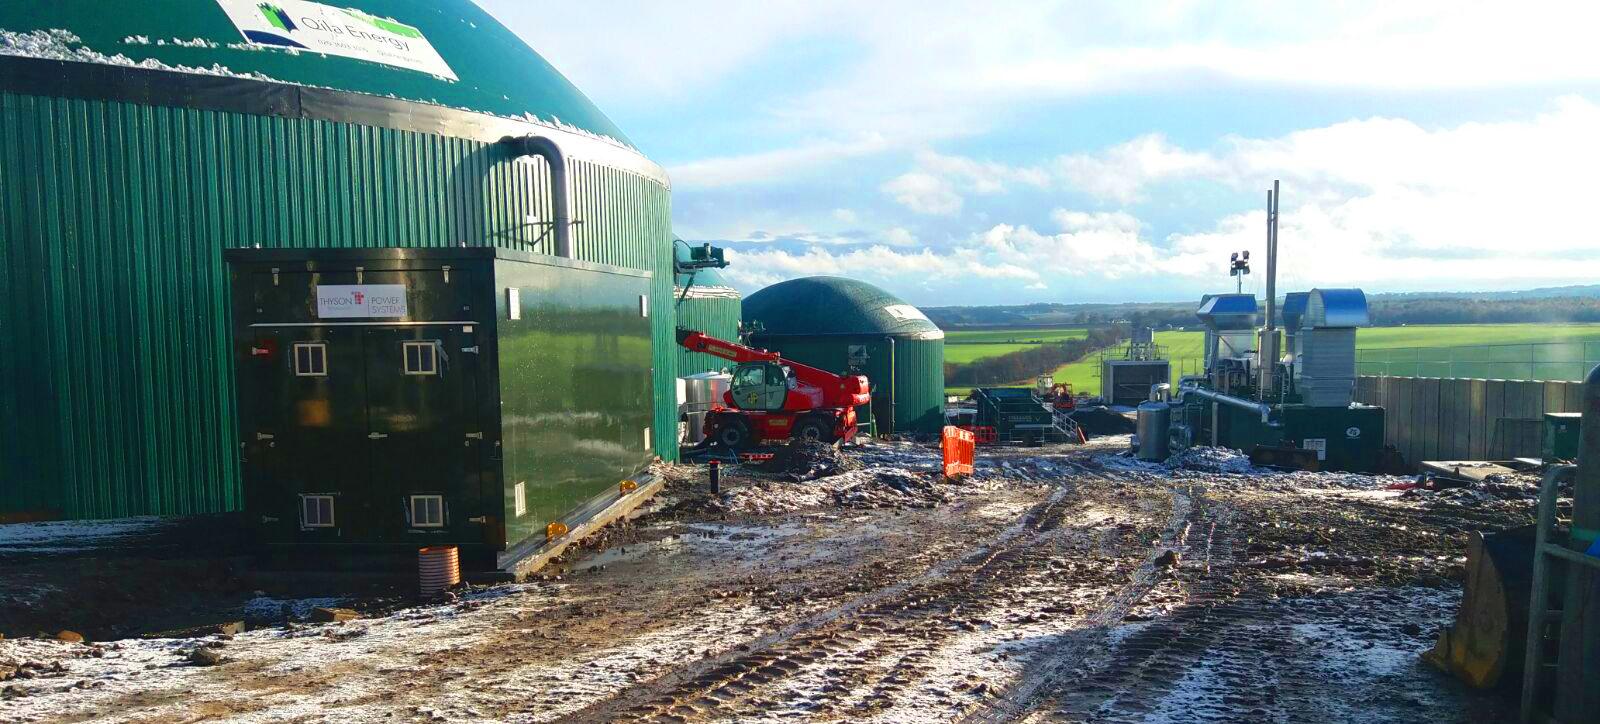 97 Planta Biogás 1MW Inchdairnie Reino Unido